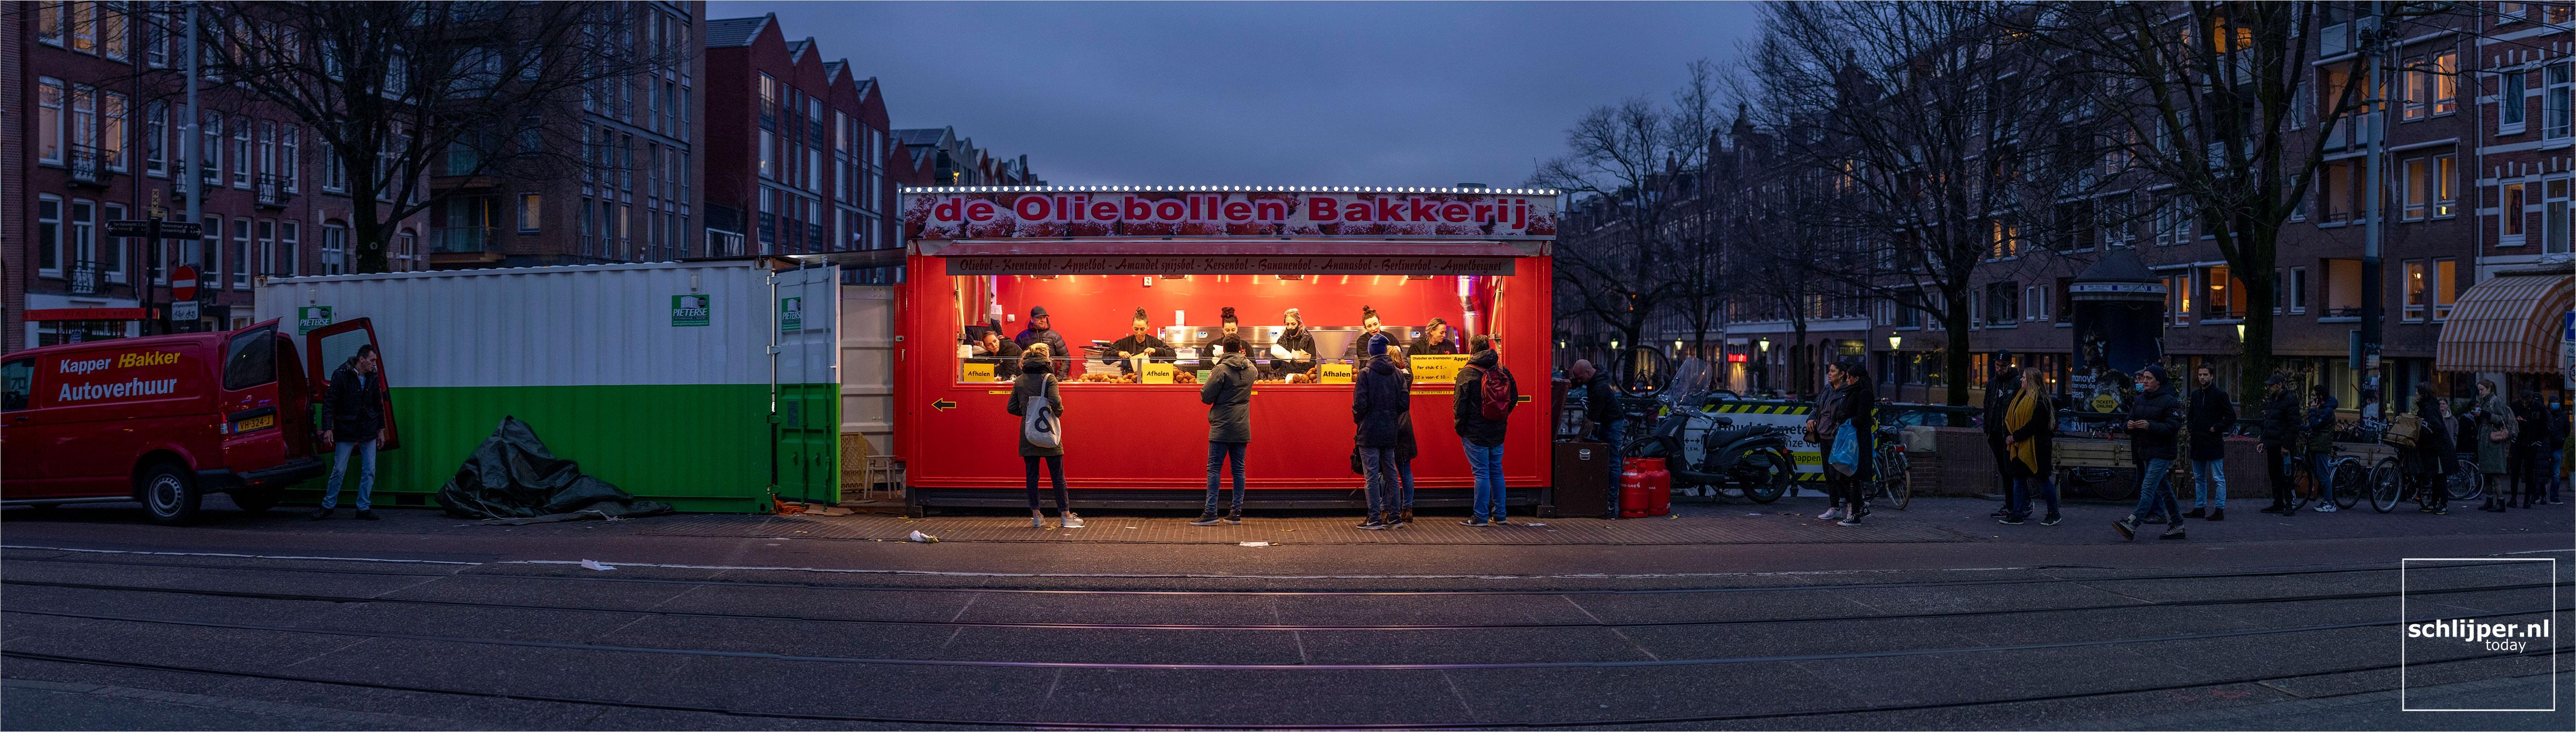 The Netherlands, Amsterdam, 31 december 2020